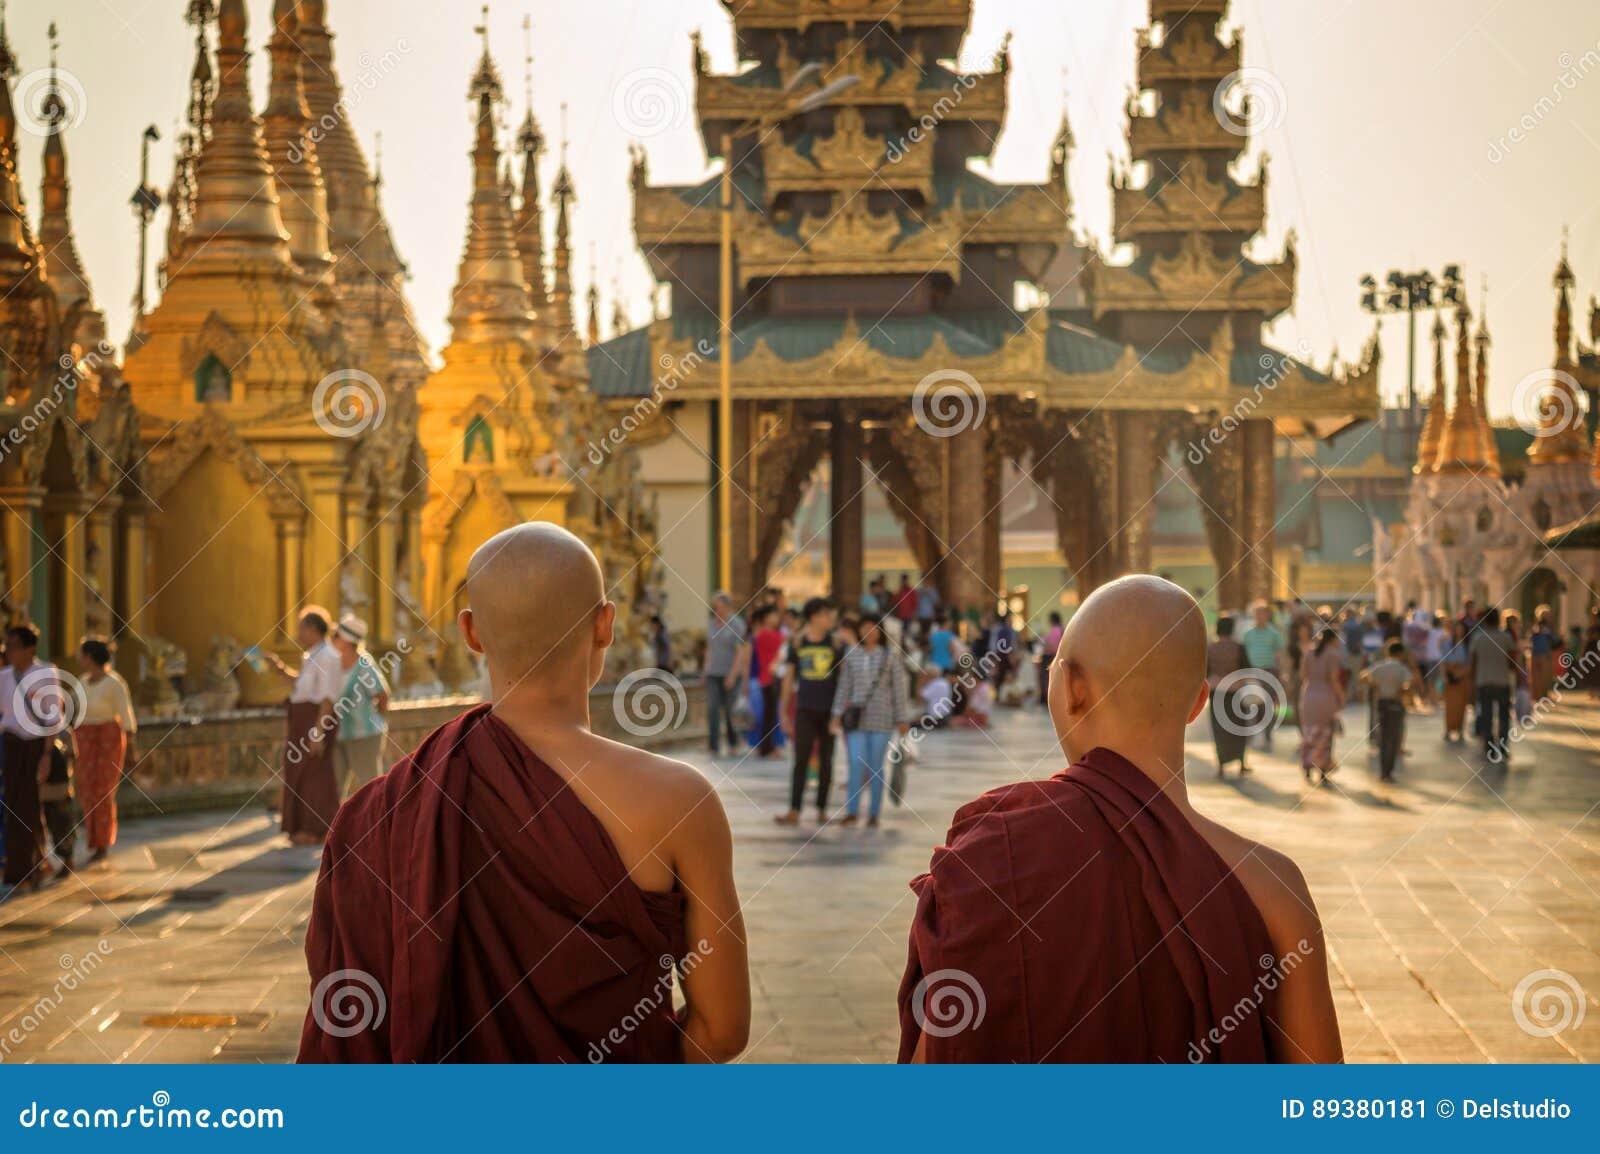 Monniken bij Shwedagon-Pagode in Yangon, Birma Myanmar